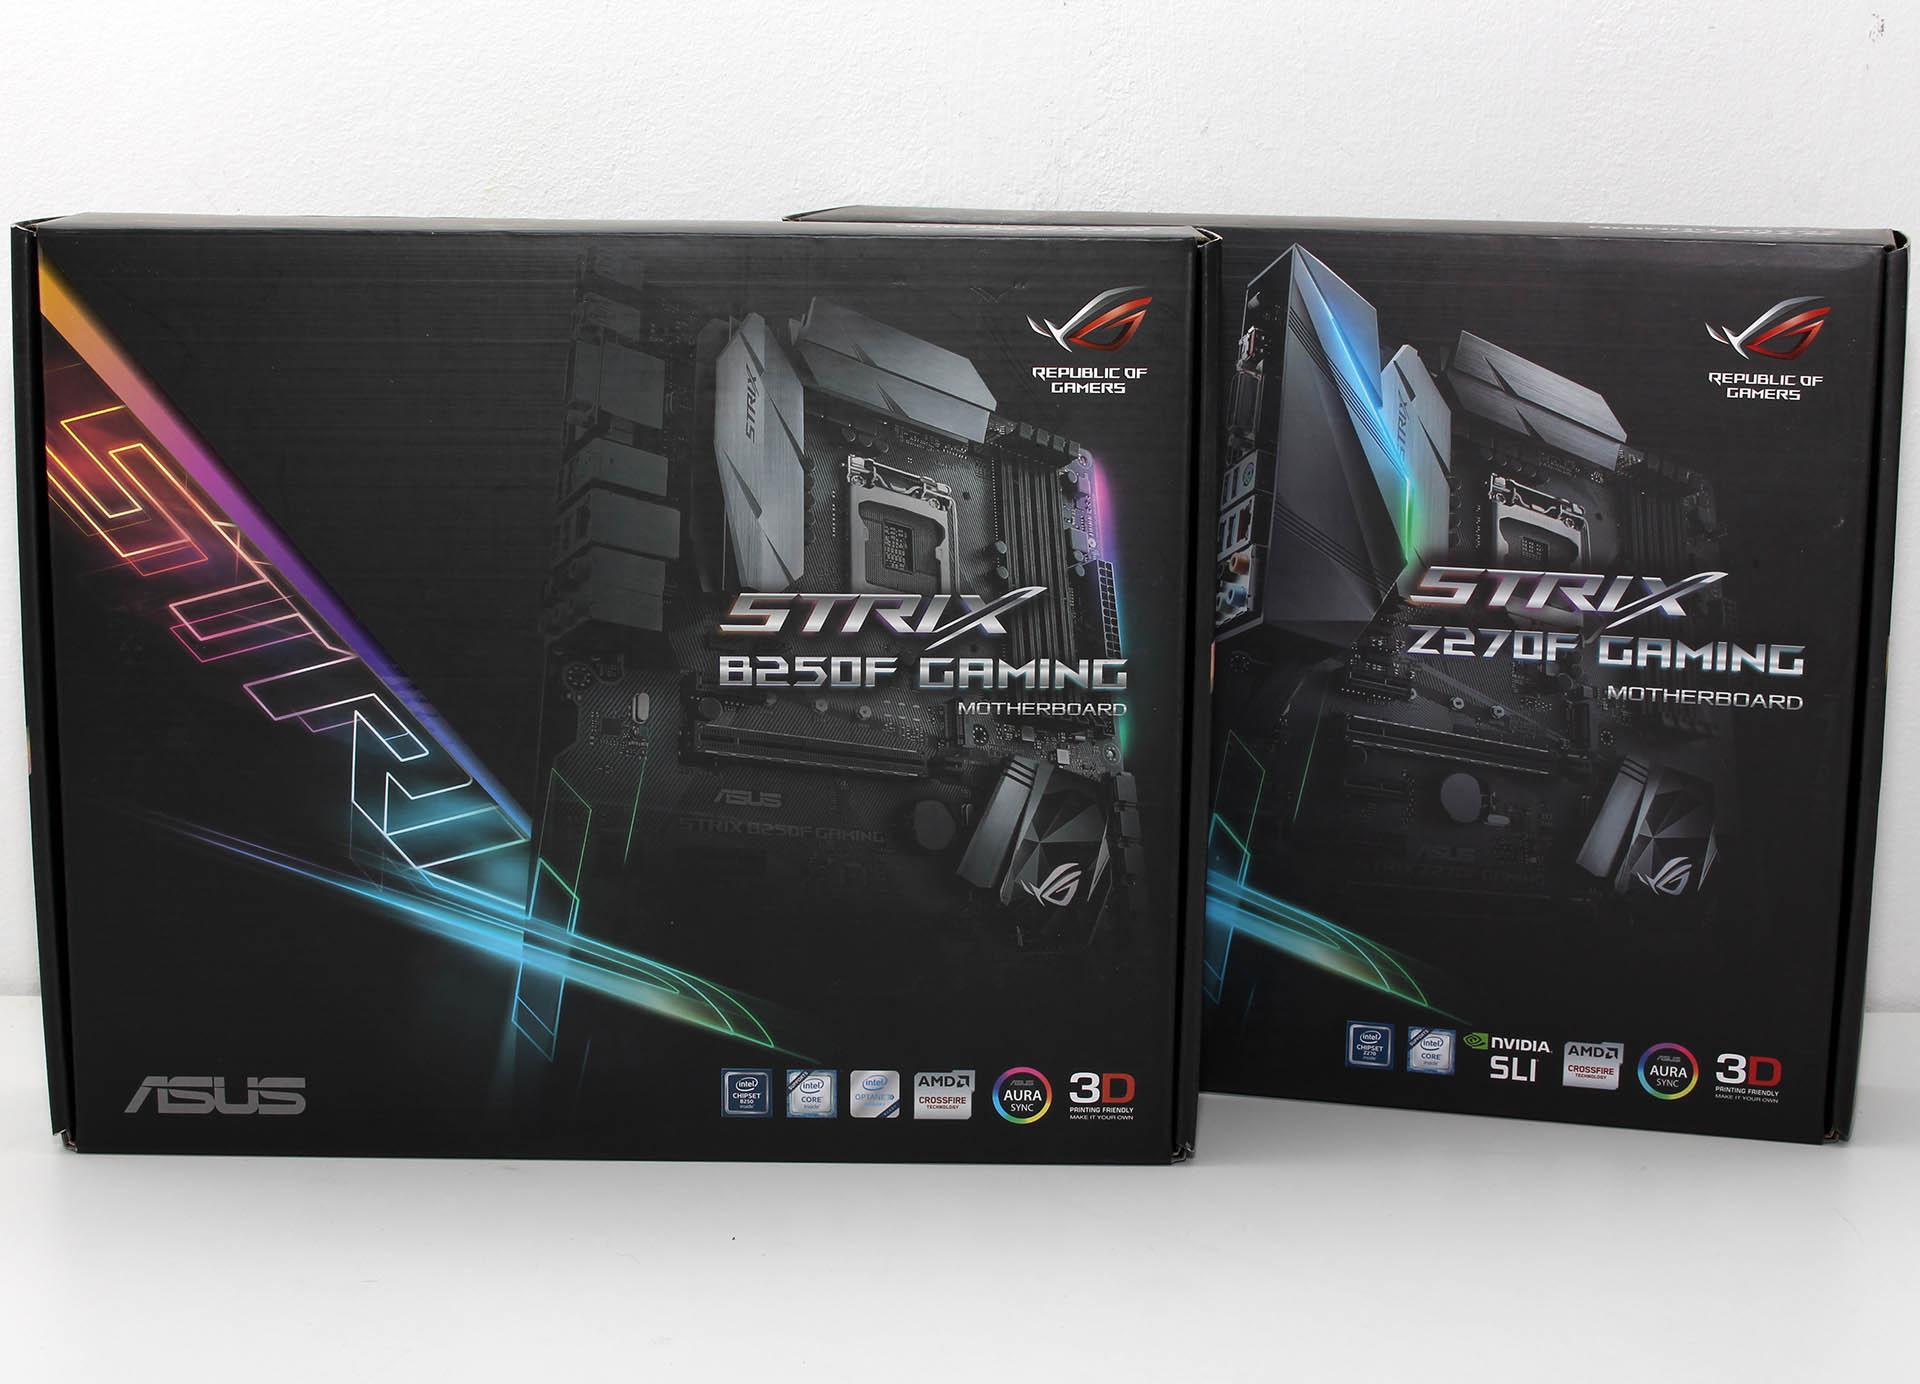 ASUS STRIX Z270F Gaming & B250F Gaming recenzija